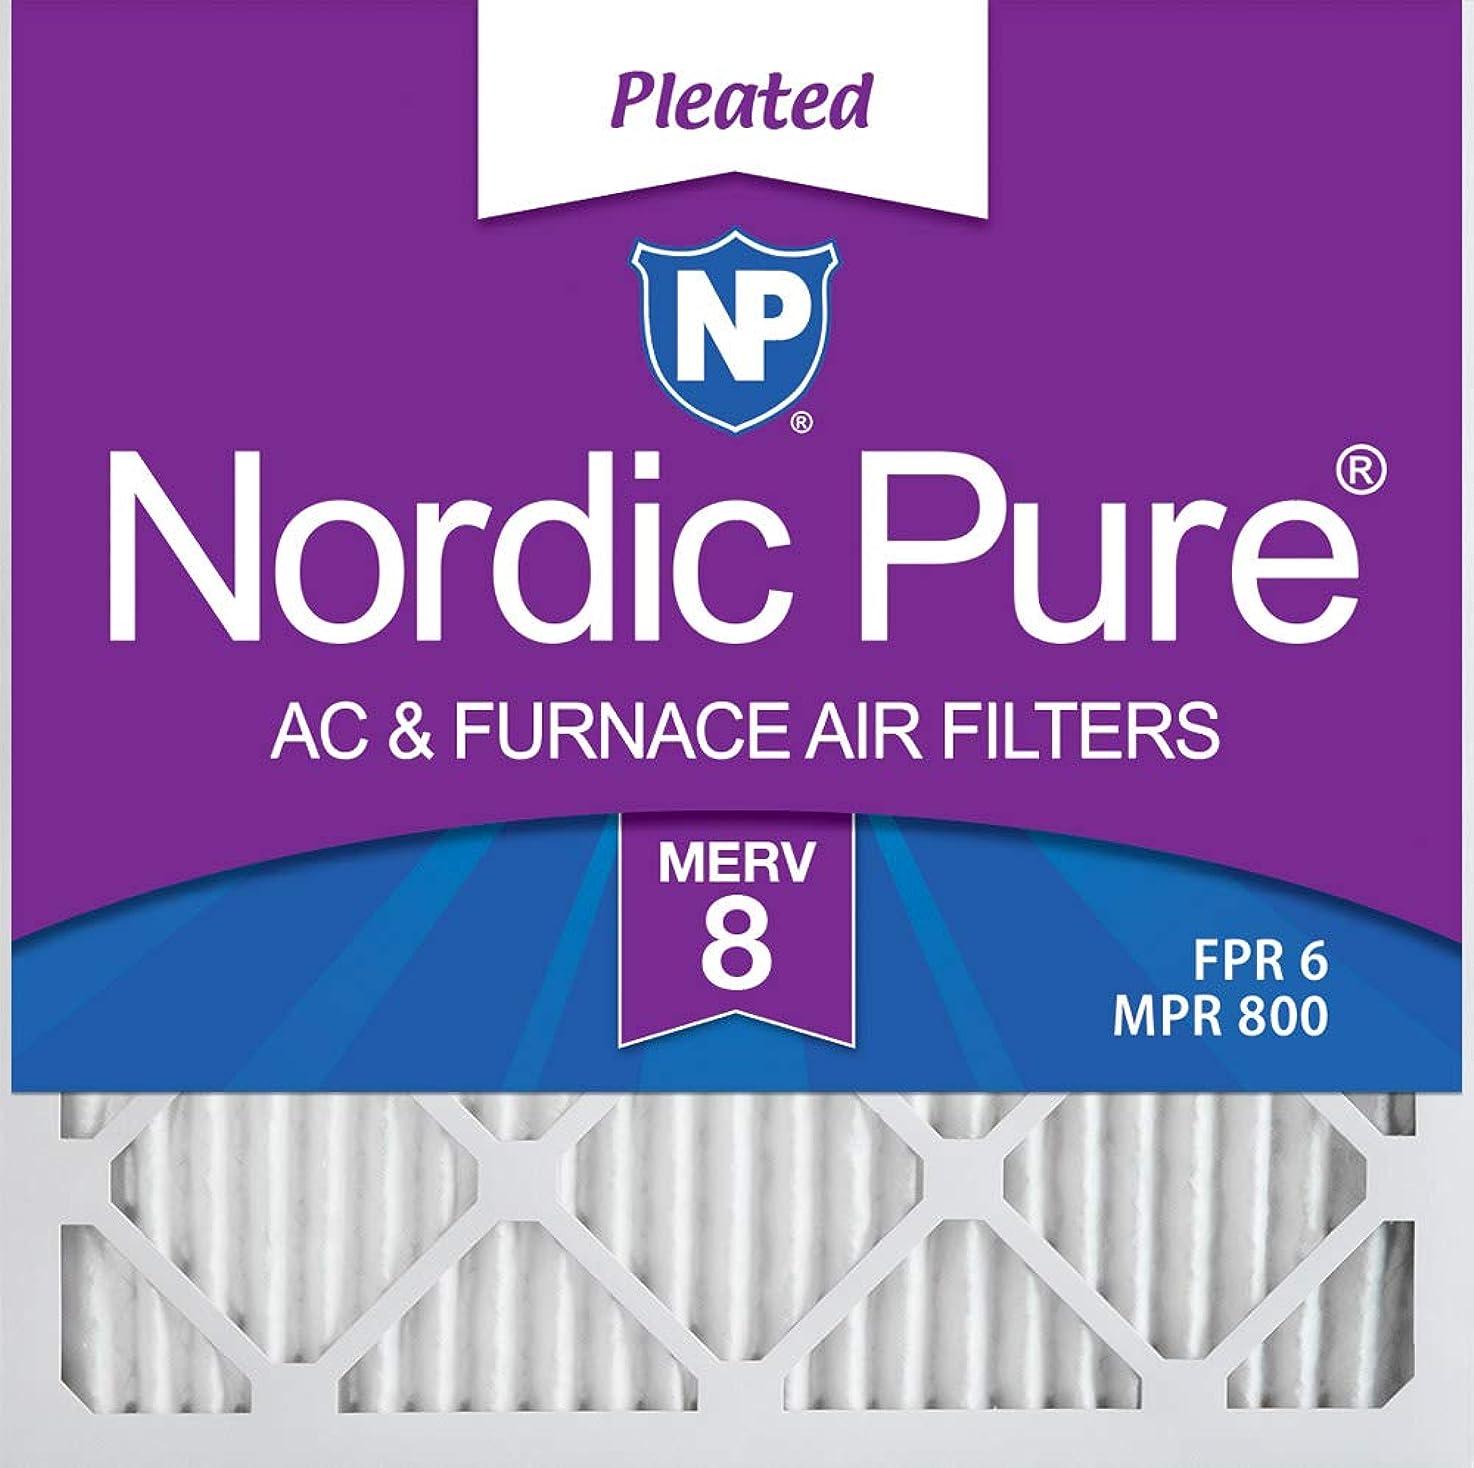 Nordic Pure 20x20x1 MERV 8 Pleated AC Furnace Air Filters, 20x20x1M8-6, 6 Pack bwiwdfloojbst0